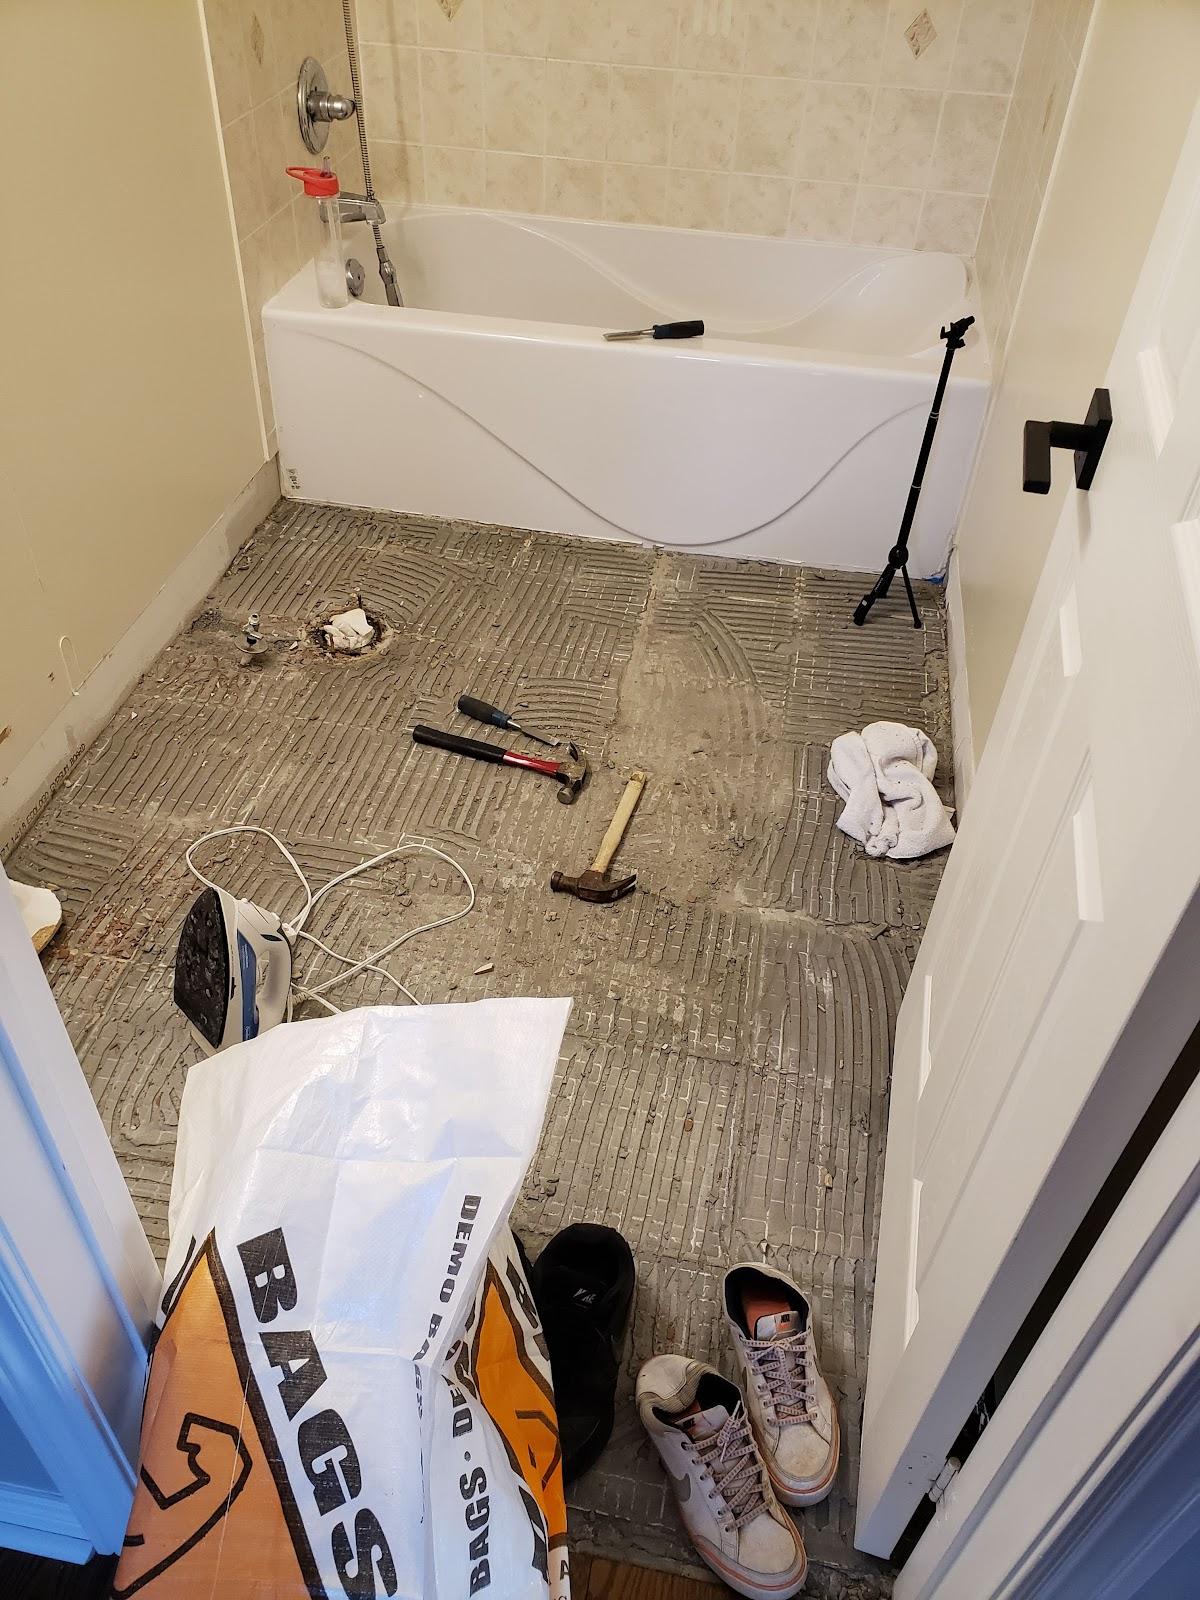 Remove bathroom floor tiles for a bathroom renovation